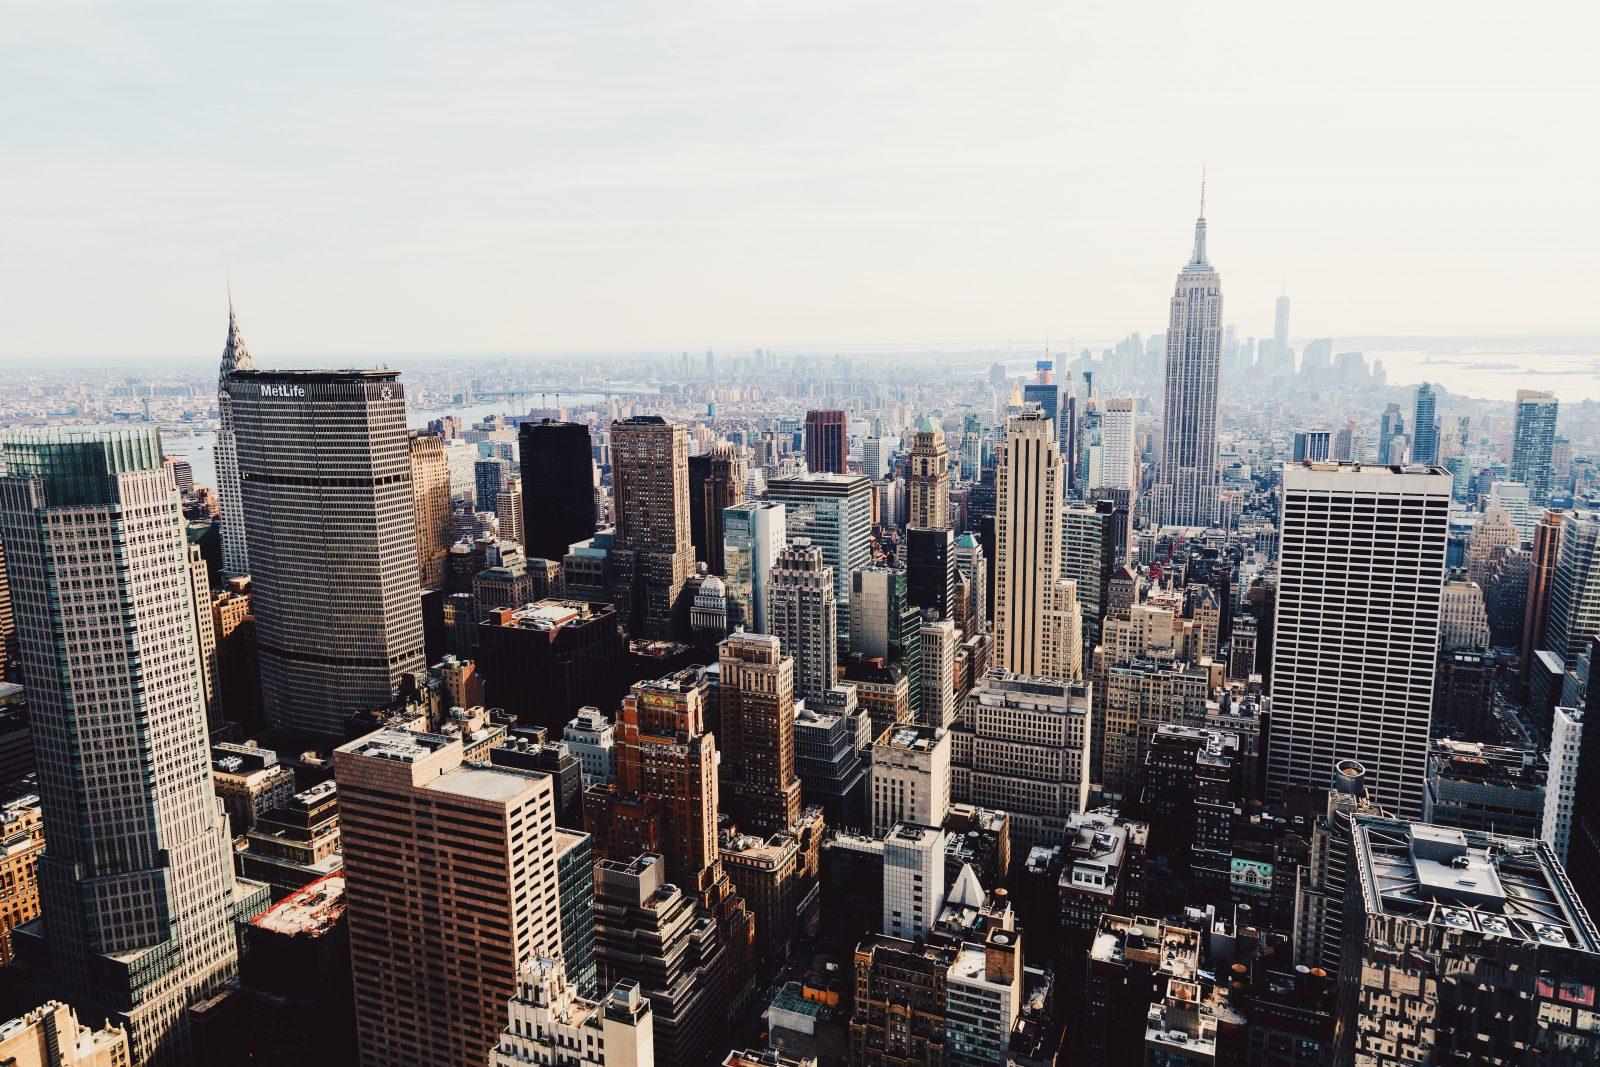 lysap 0gfm8 - Rockefeller Center